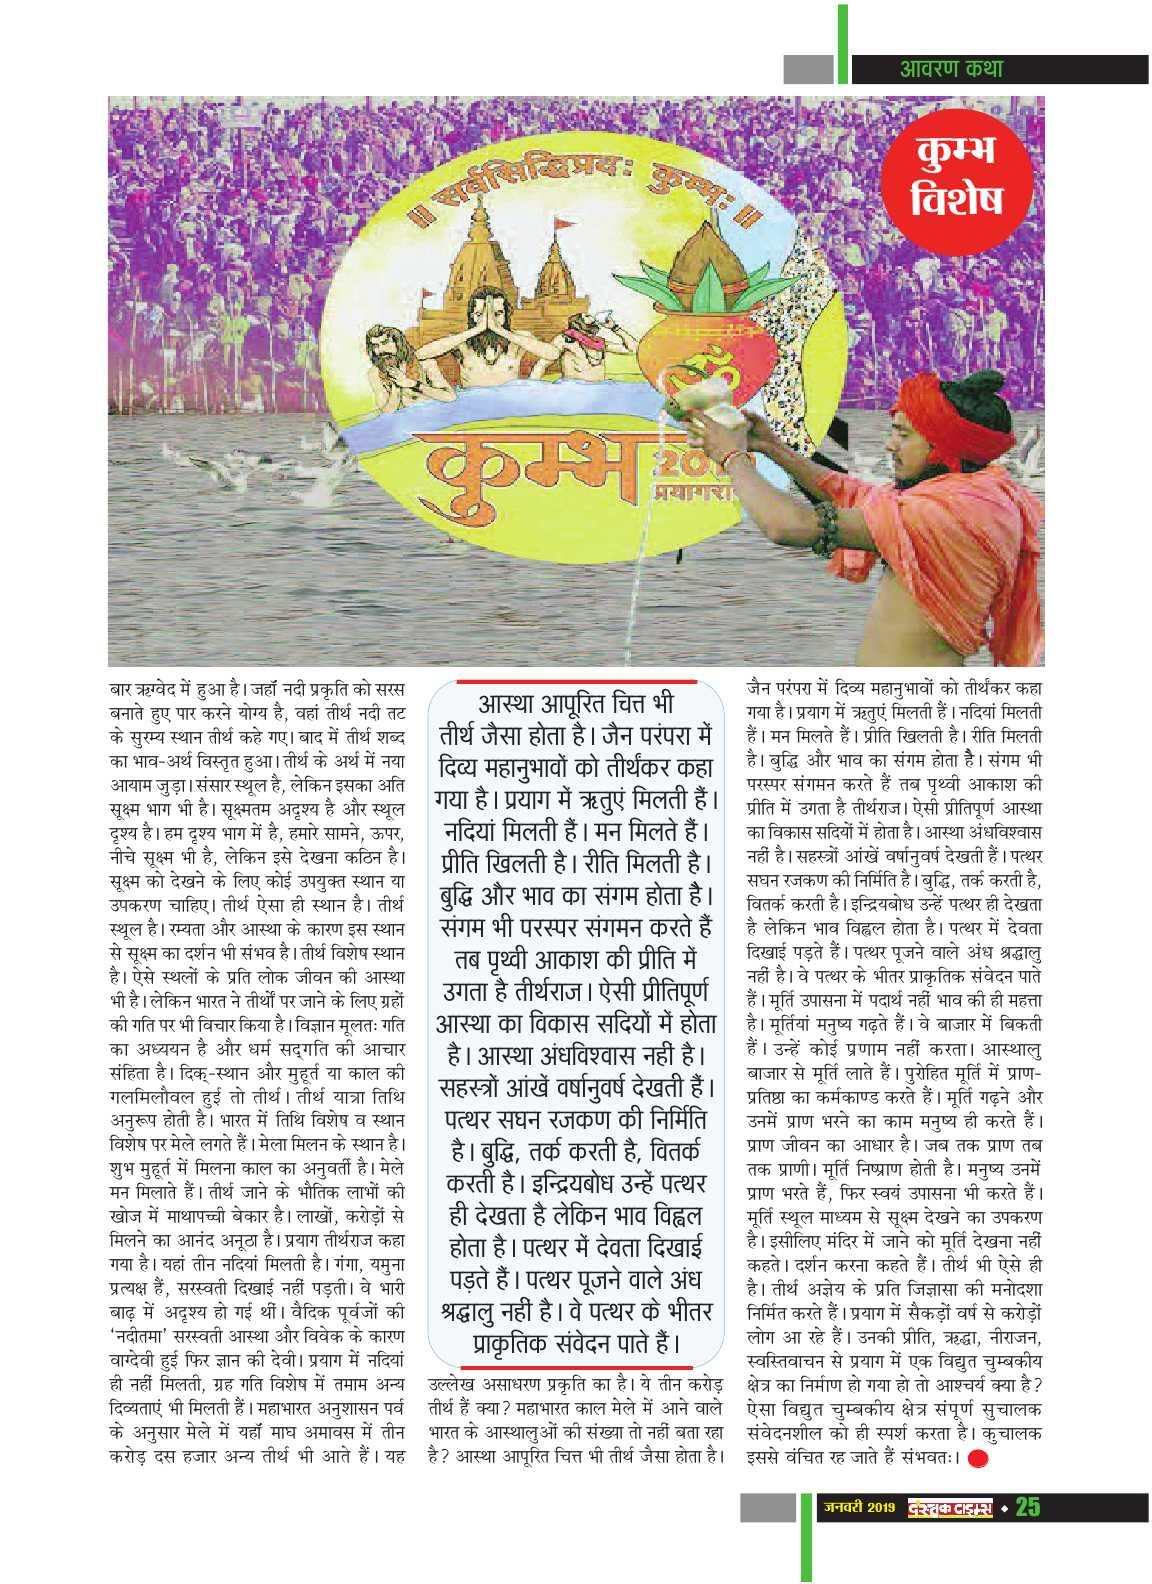 Dastak Times for E-Magazine 15 Jan 2019 new27